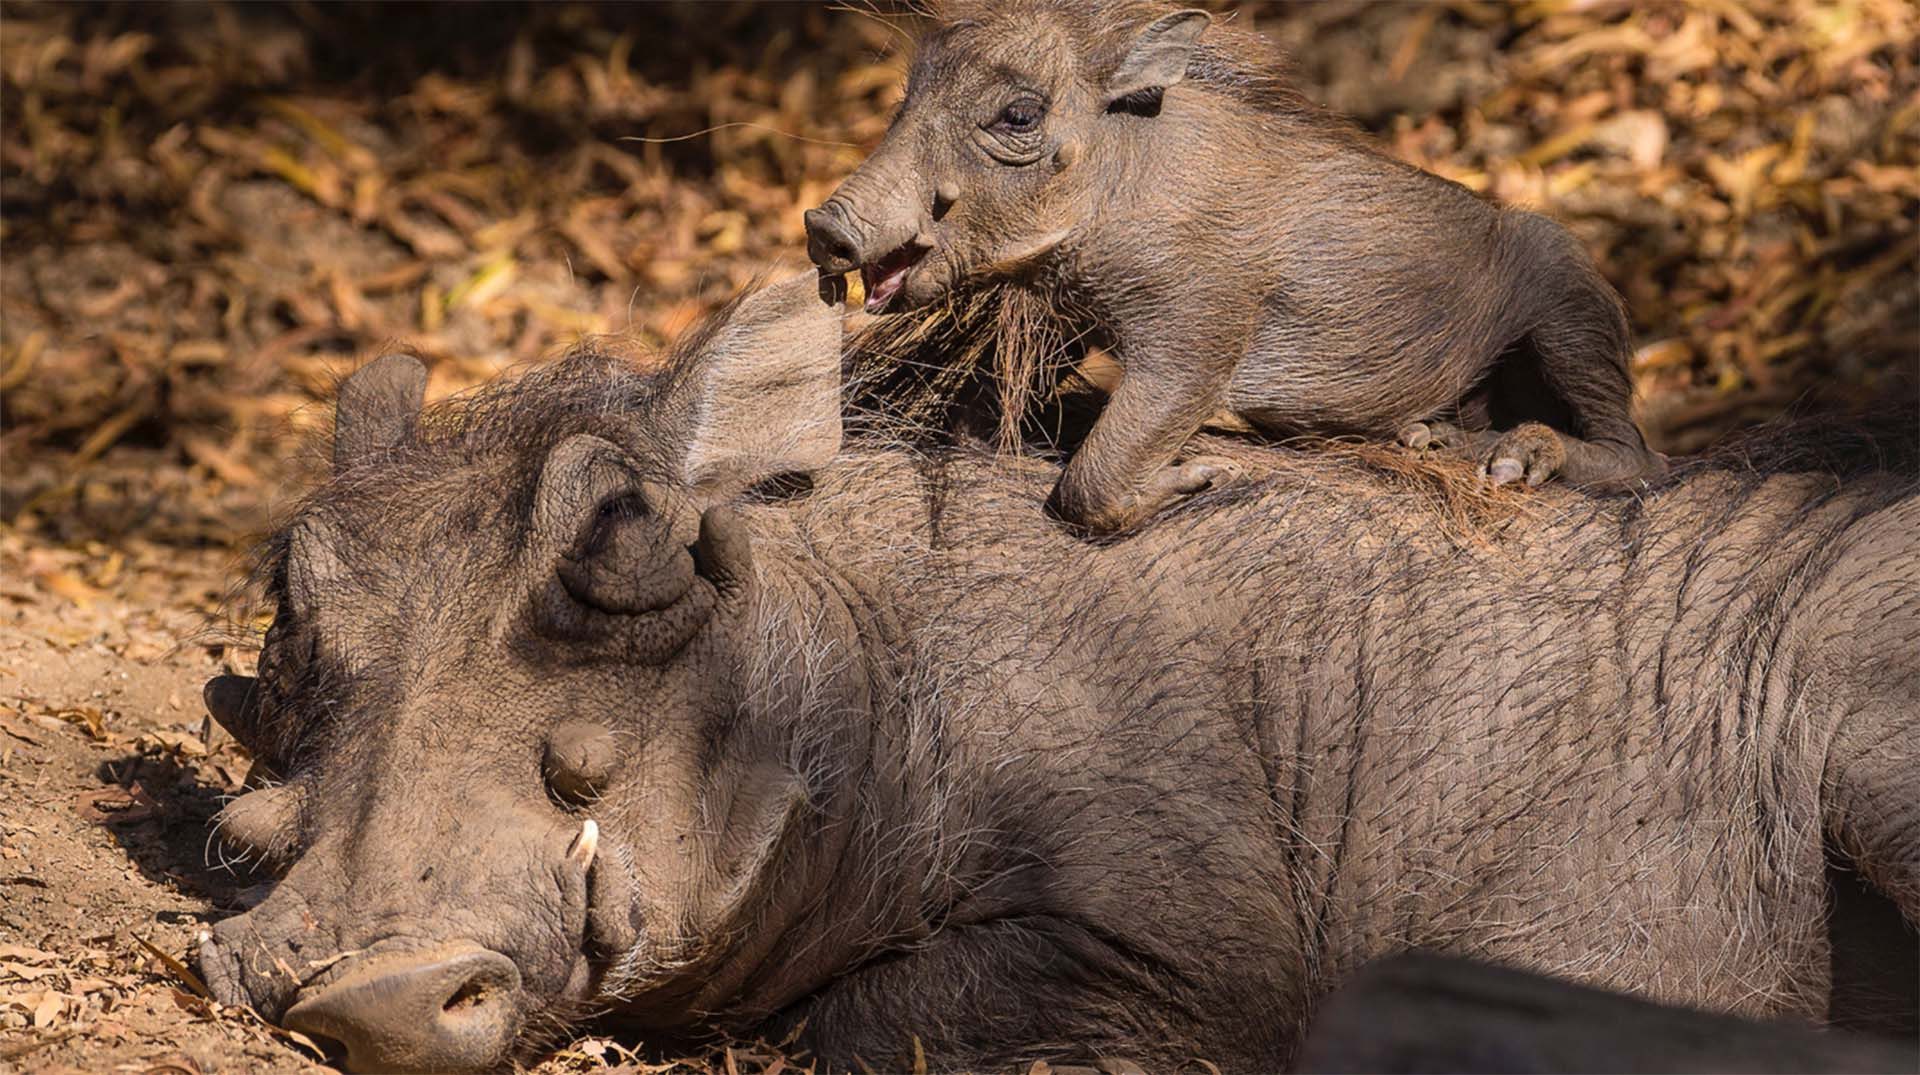 warthog san diego zoo animals plants